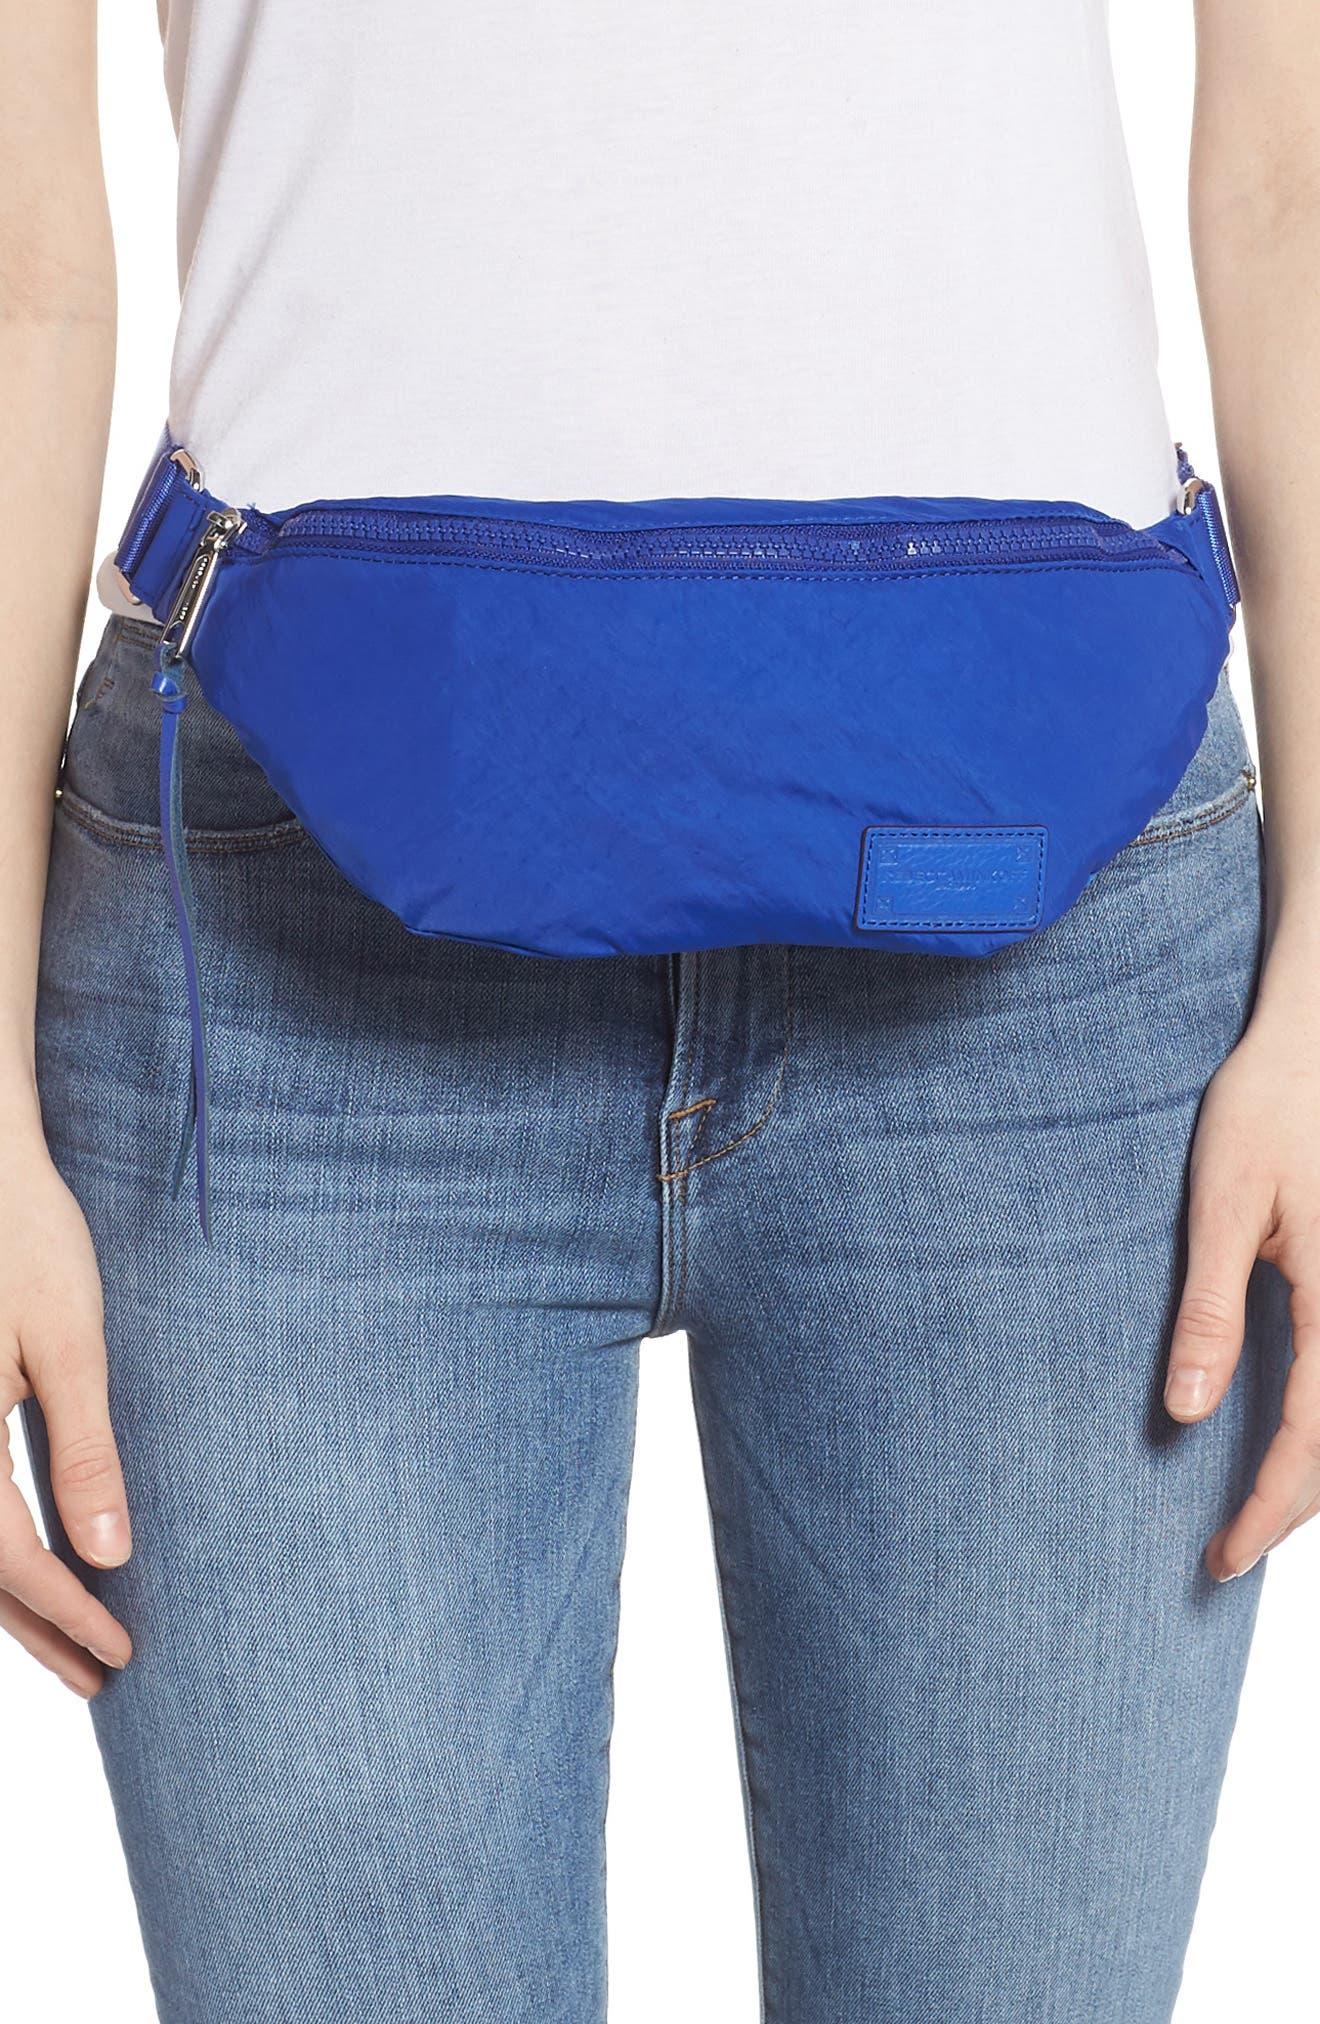 REBECCA MINKOFF, Nylon Belt Bag, Alternate thumbnail 2, color, BRIGHT BLUE